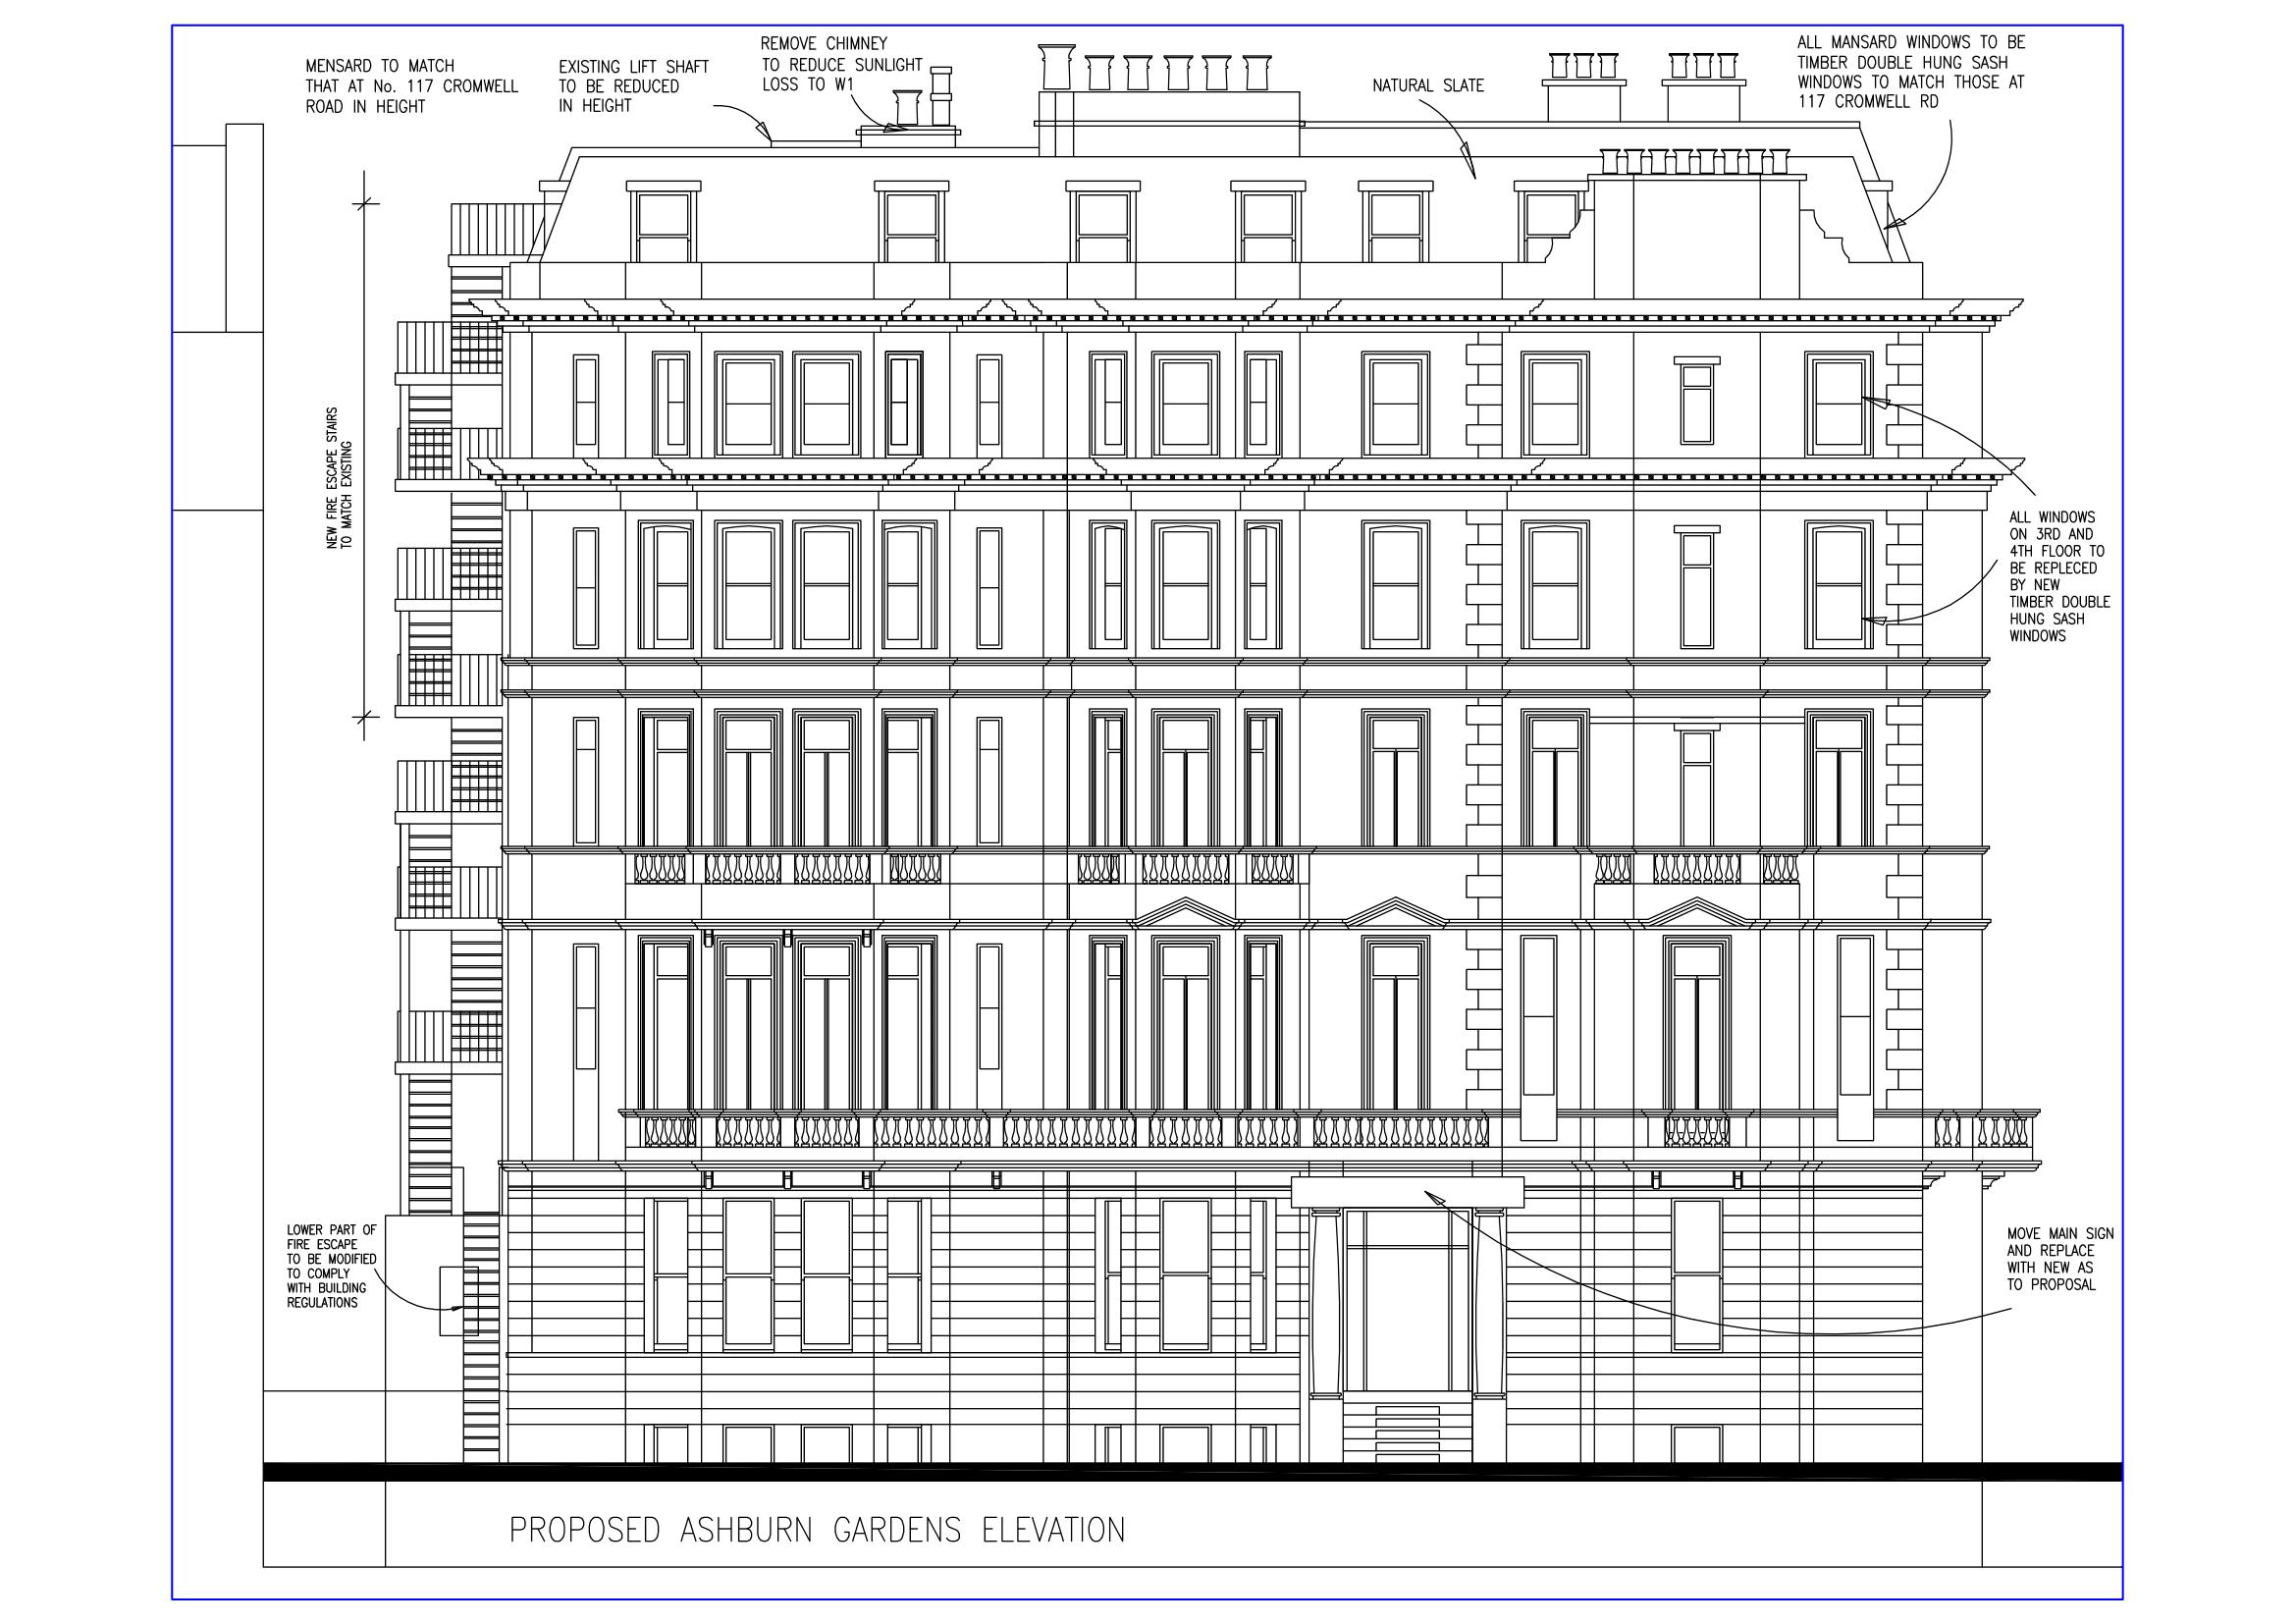 Blue print for buildings